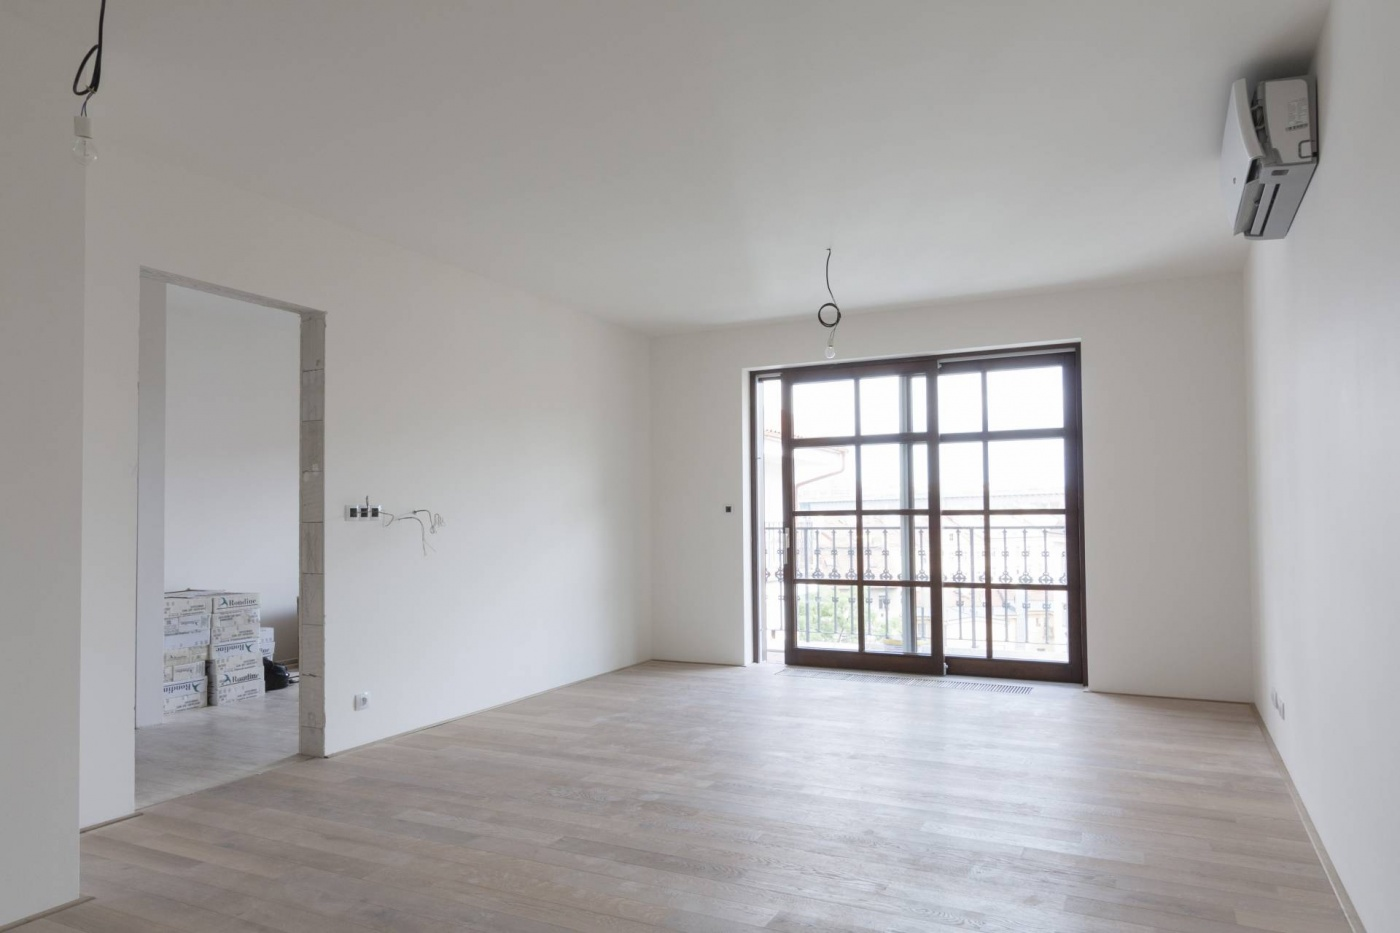 Půdní byt 2+kk, plocha 79 m², ulice Lumírova, Praha 2 - Vyšehrad   1